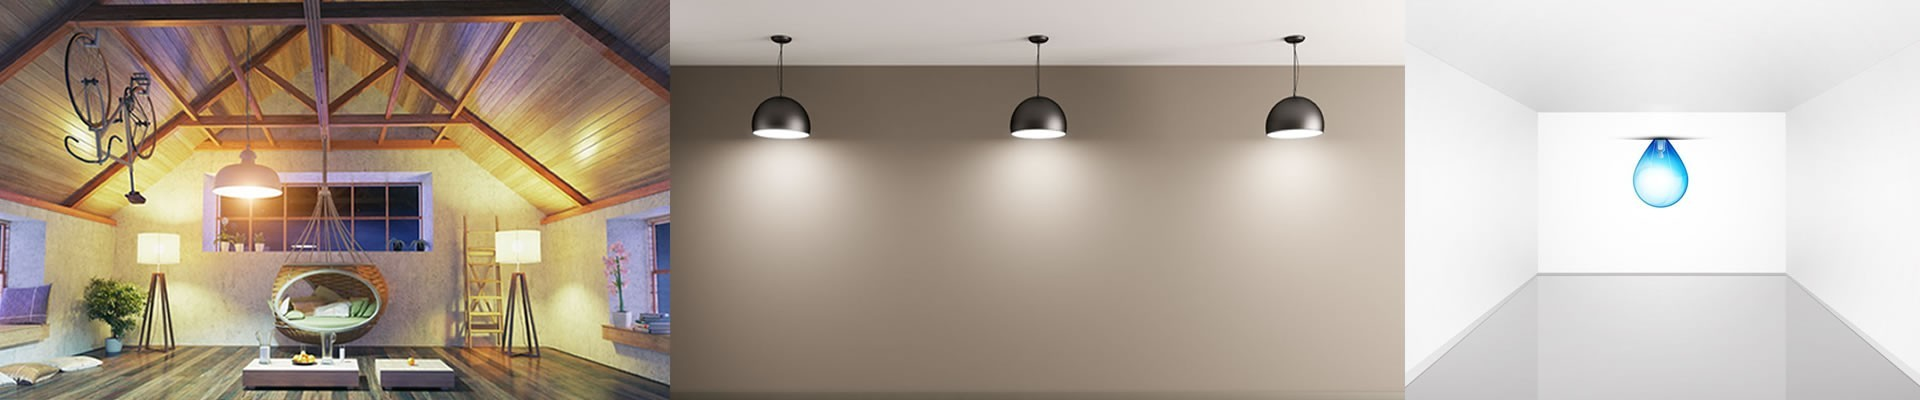 Lighting | Ceiling Lights, Wall Lights, Bathroom & Kitchen Lighting